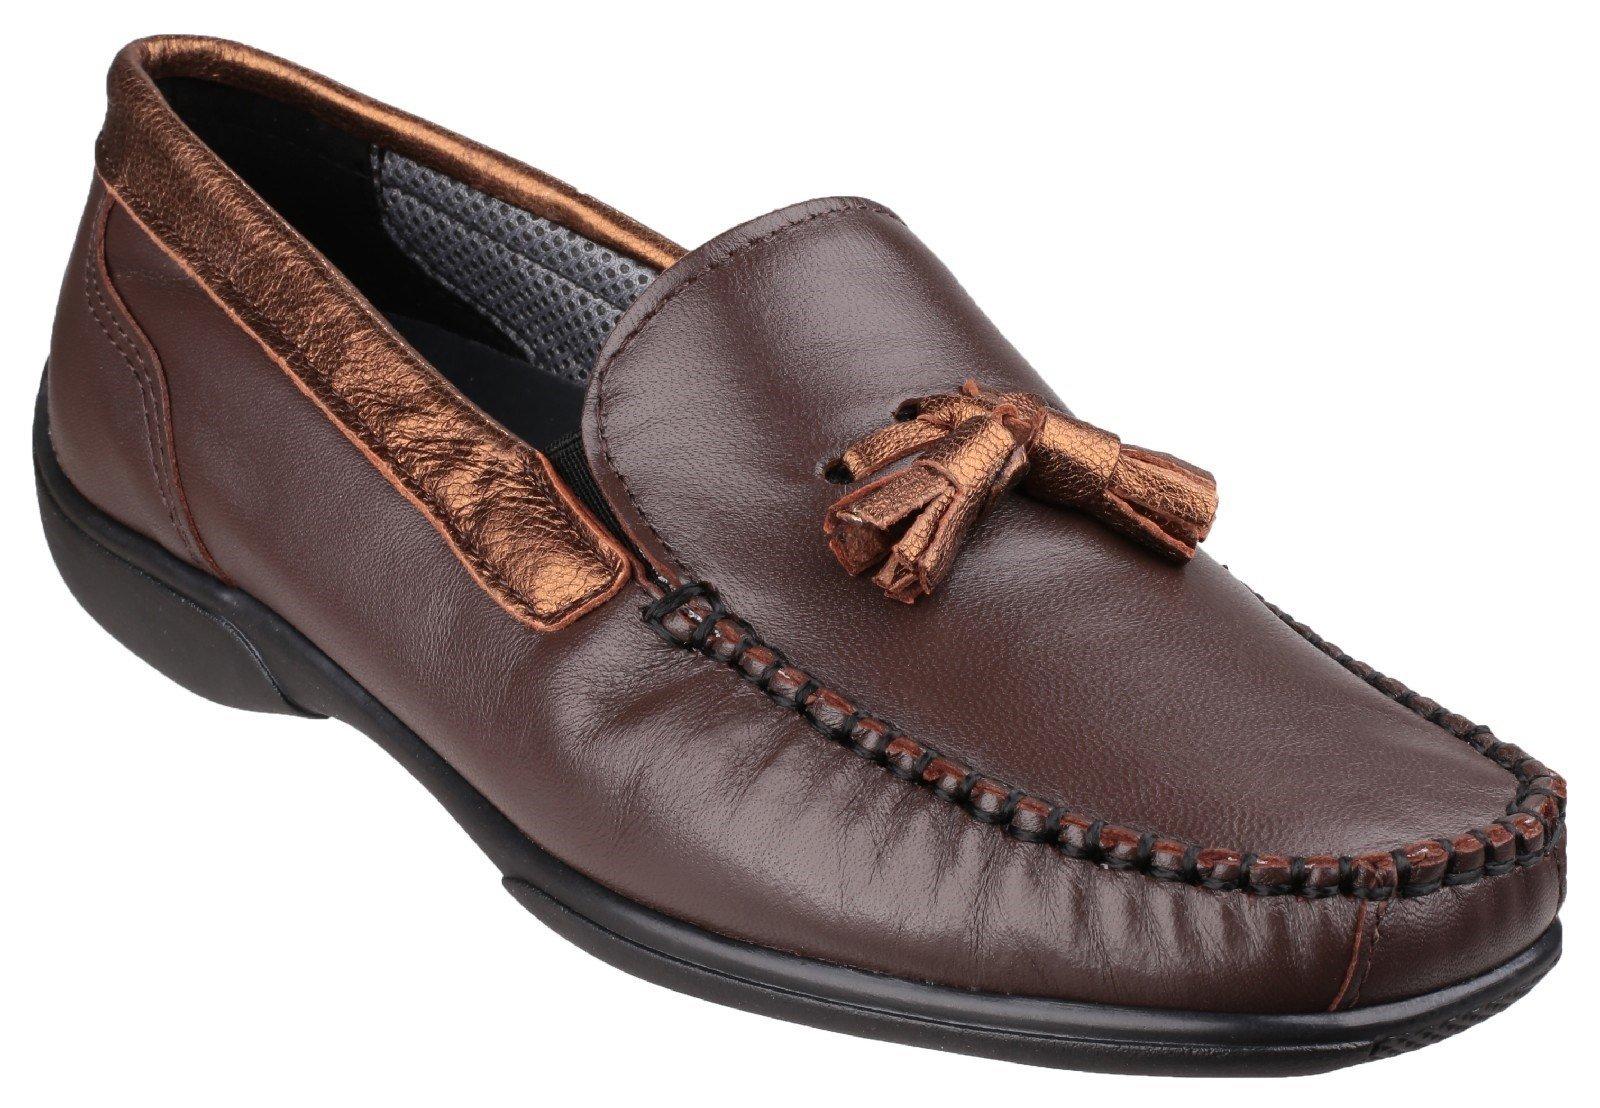 Cotswold Men's Biddlestone Slip On Loafer Shoe Various Colours 20285 - Brown/Gold 3